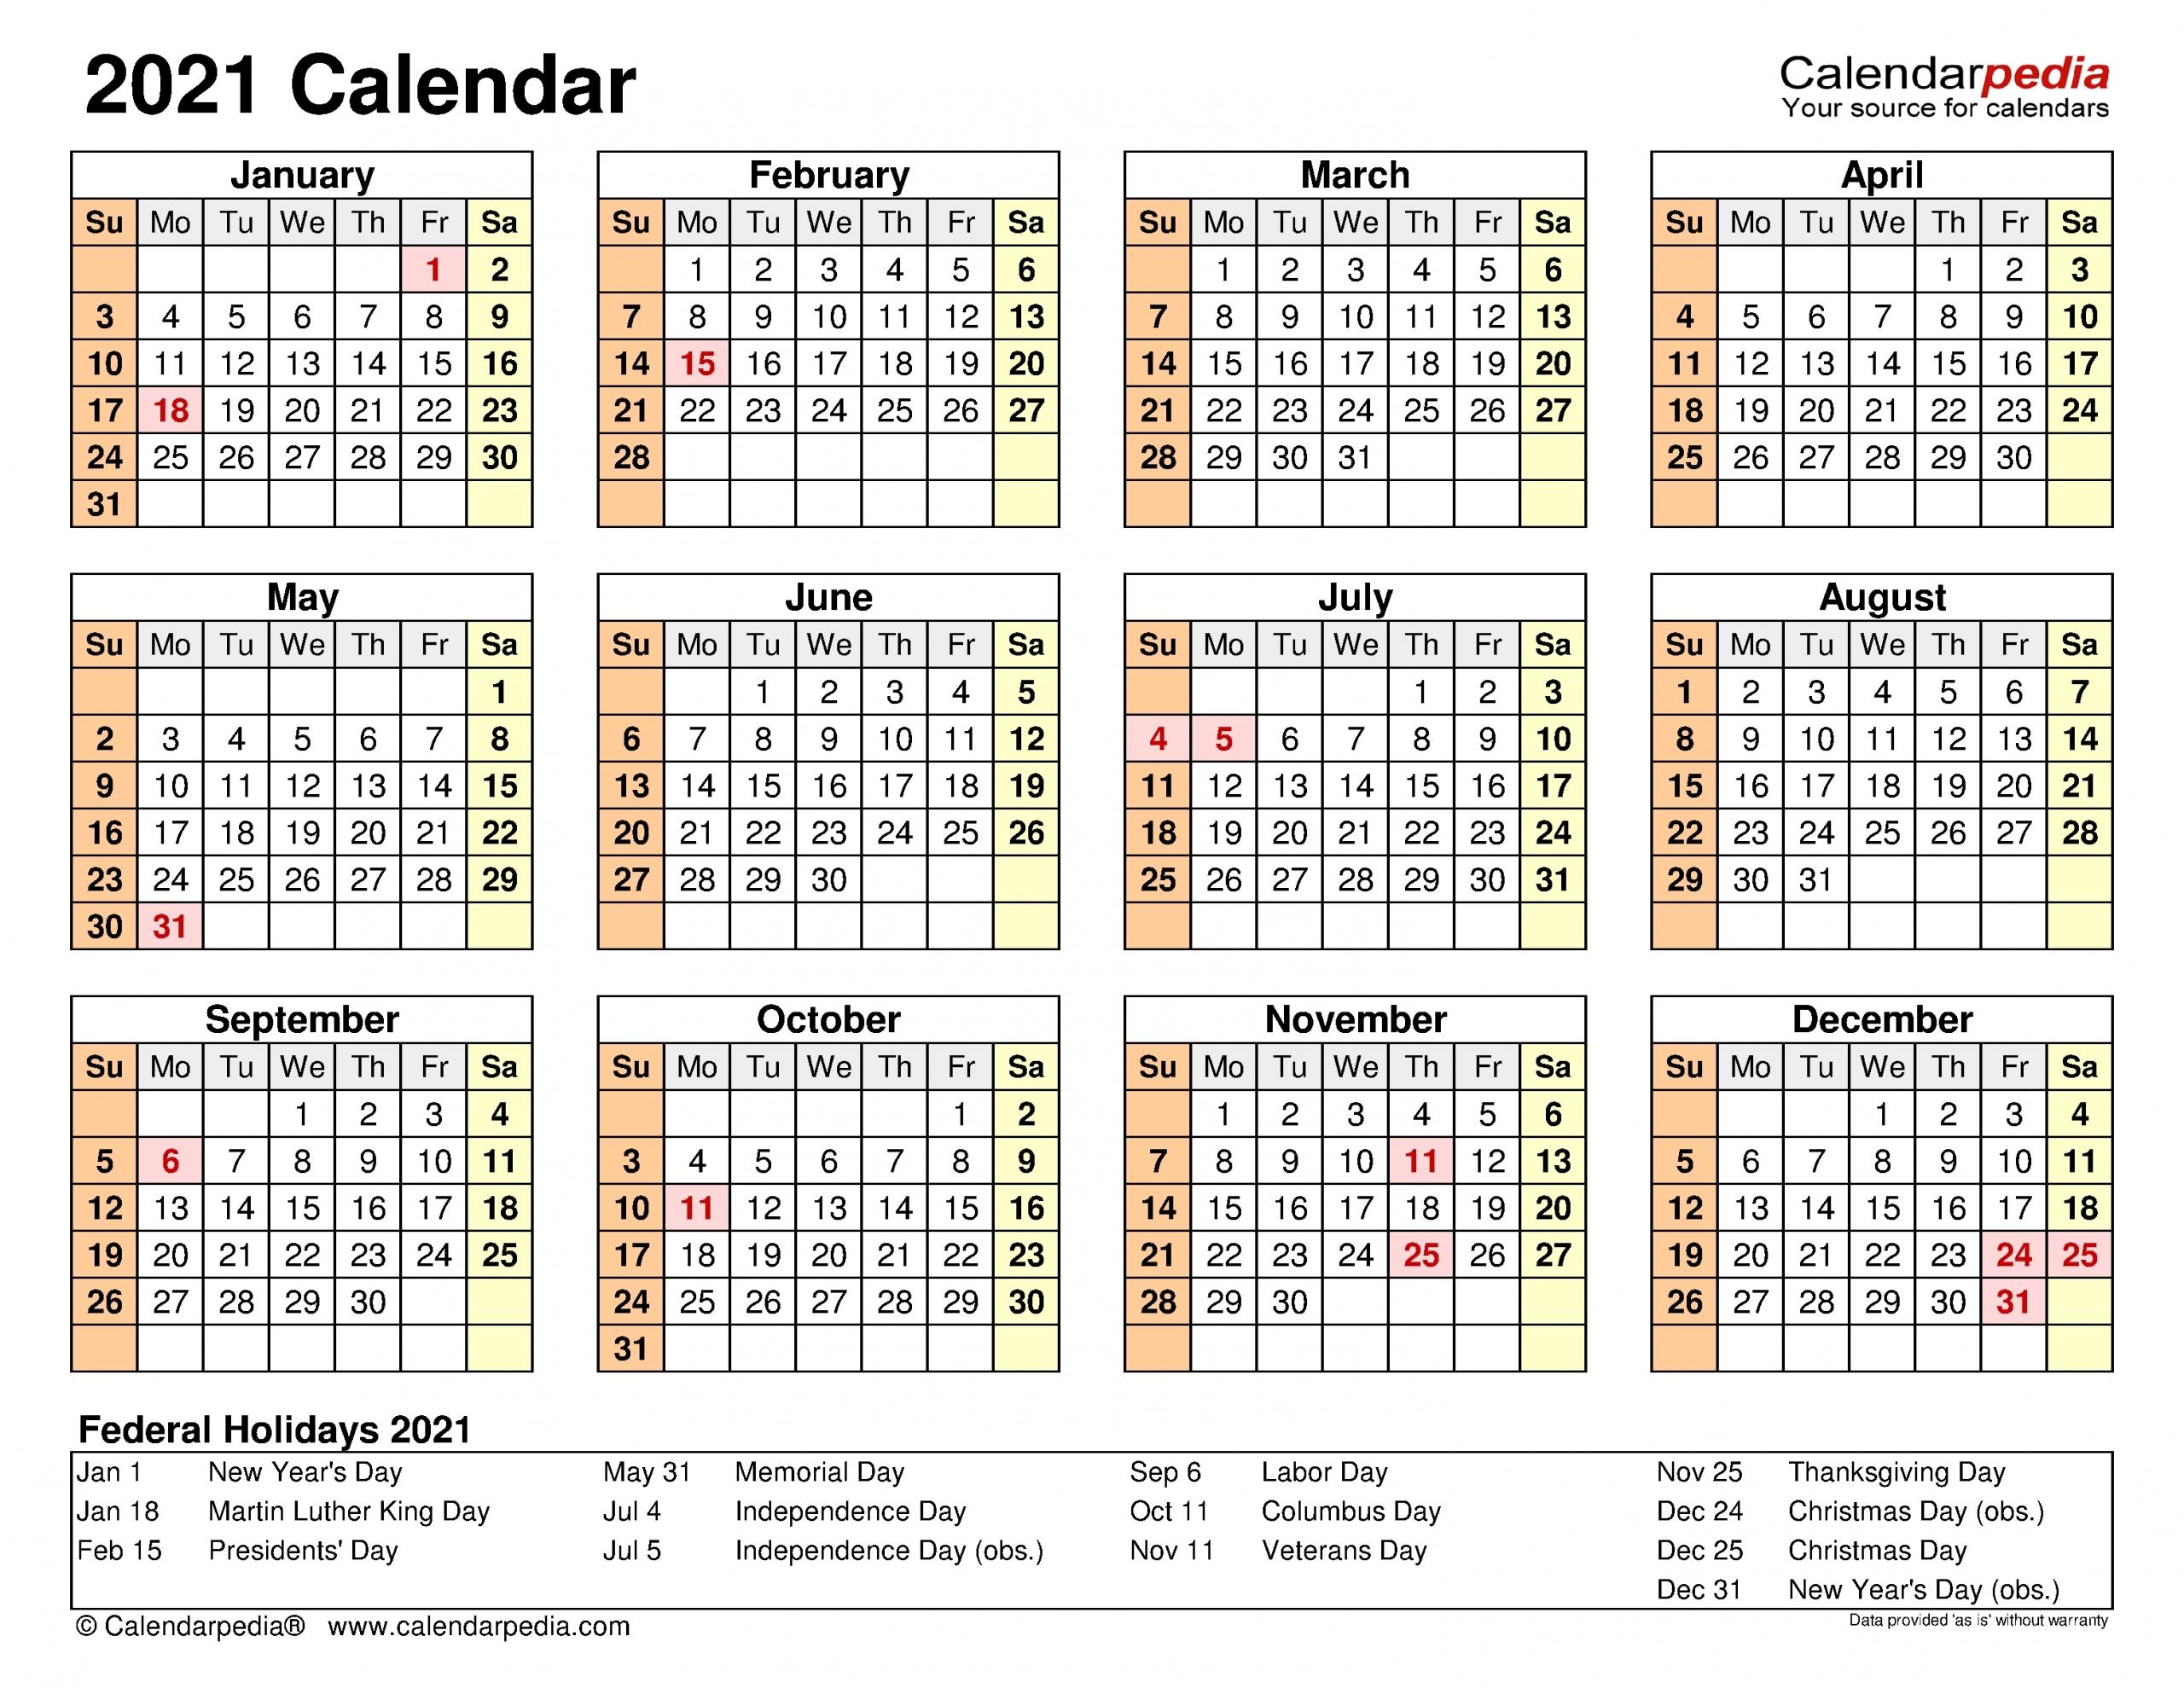 Calendar 2021 Excel | Month Calendar Printable throughout Free 2021 Calendar Excel Image